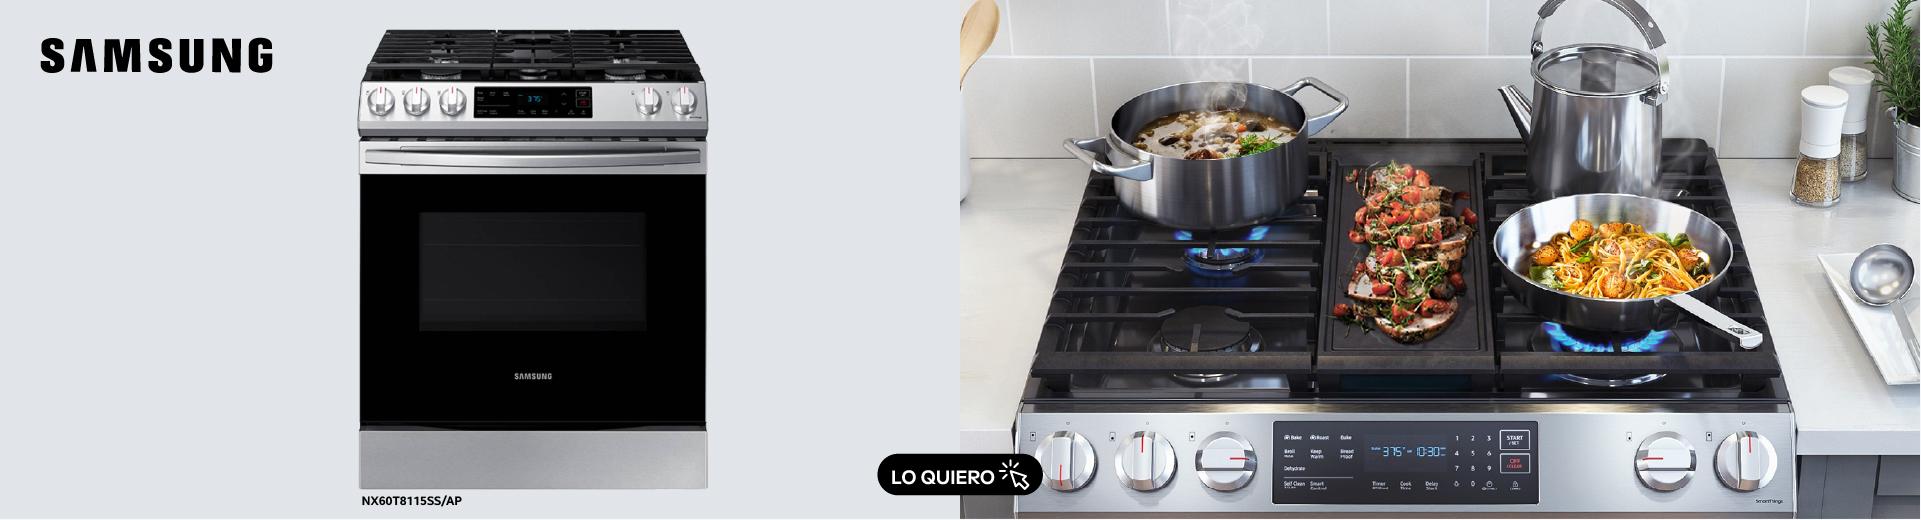 Samsung Estufa